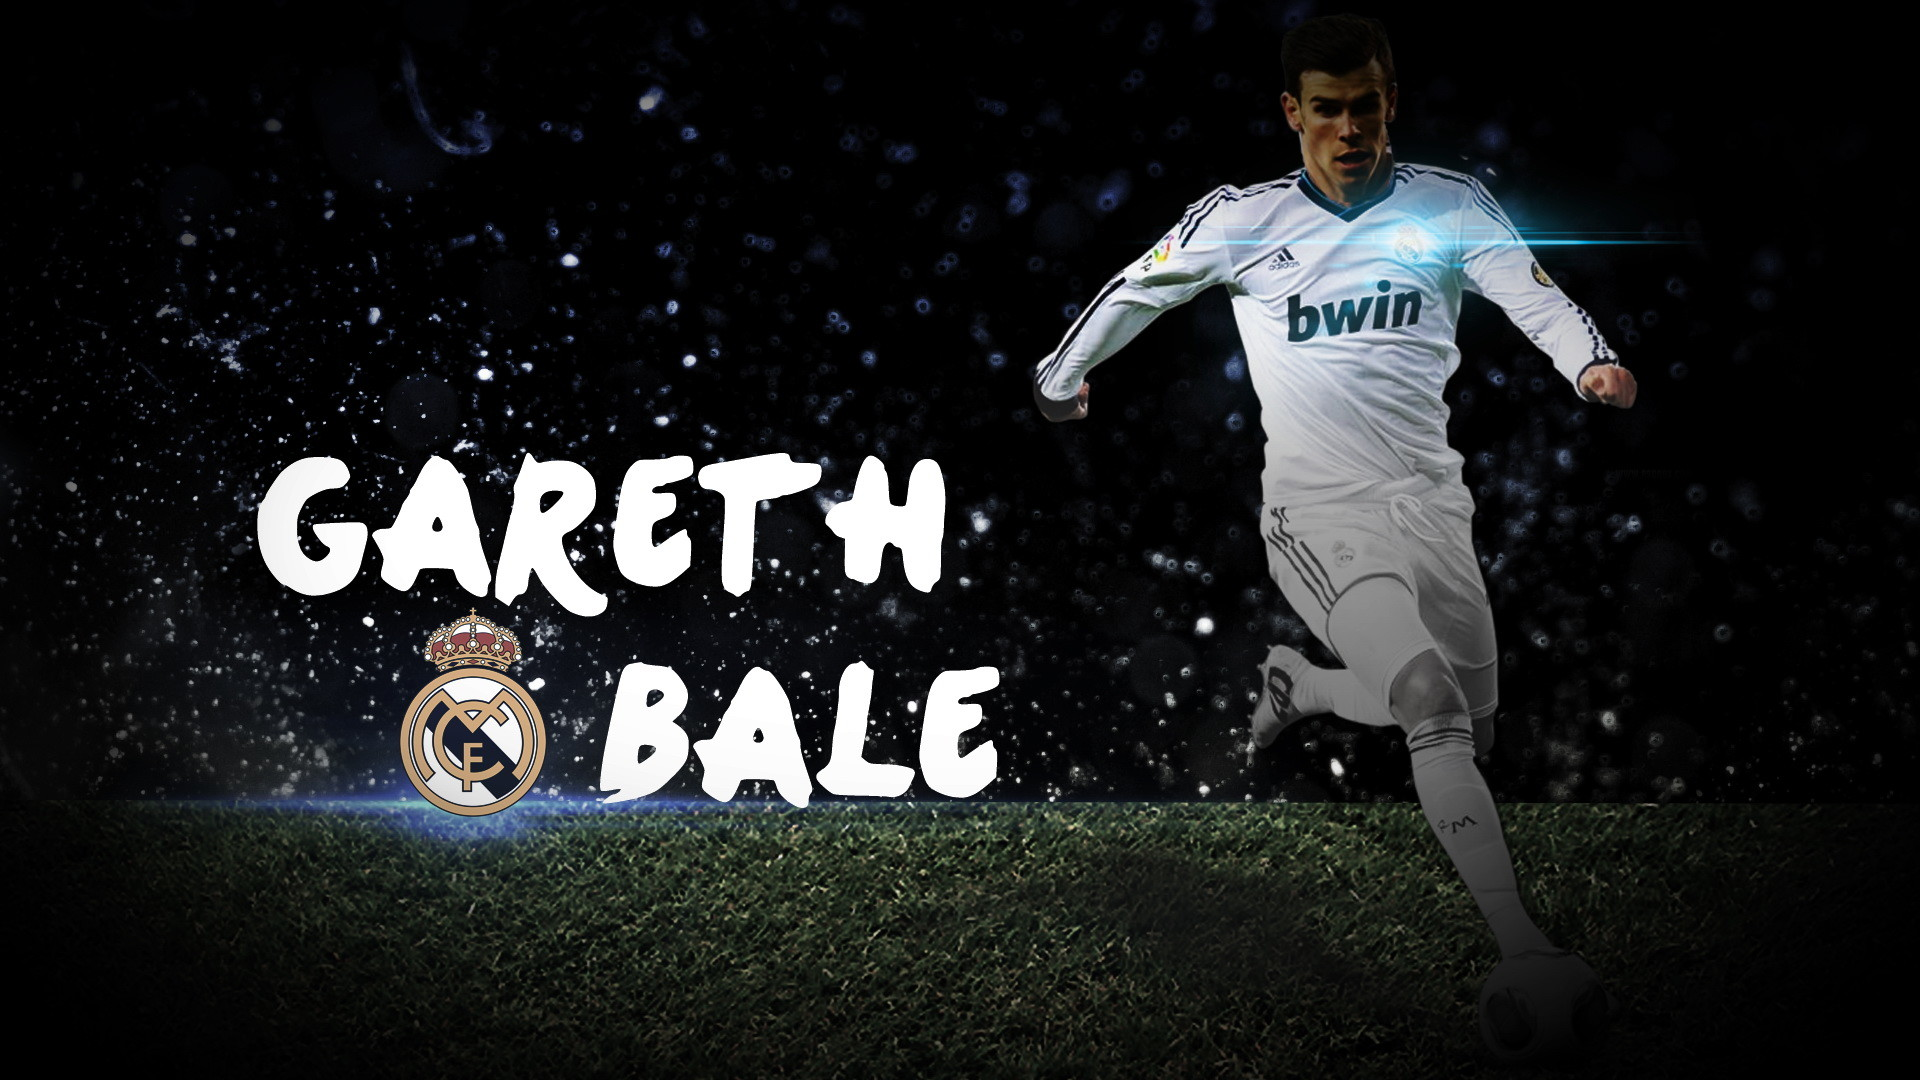 Gareth Bale Football Wallpaper